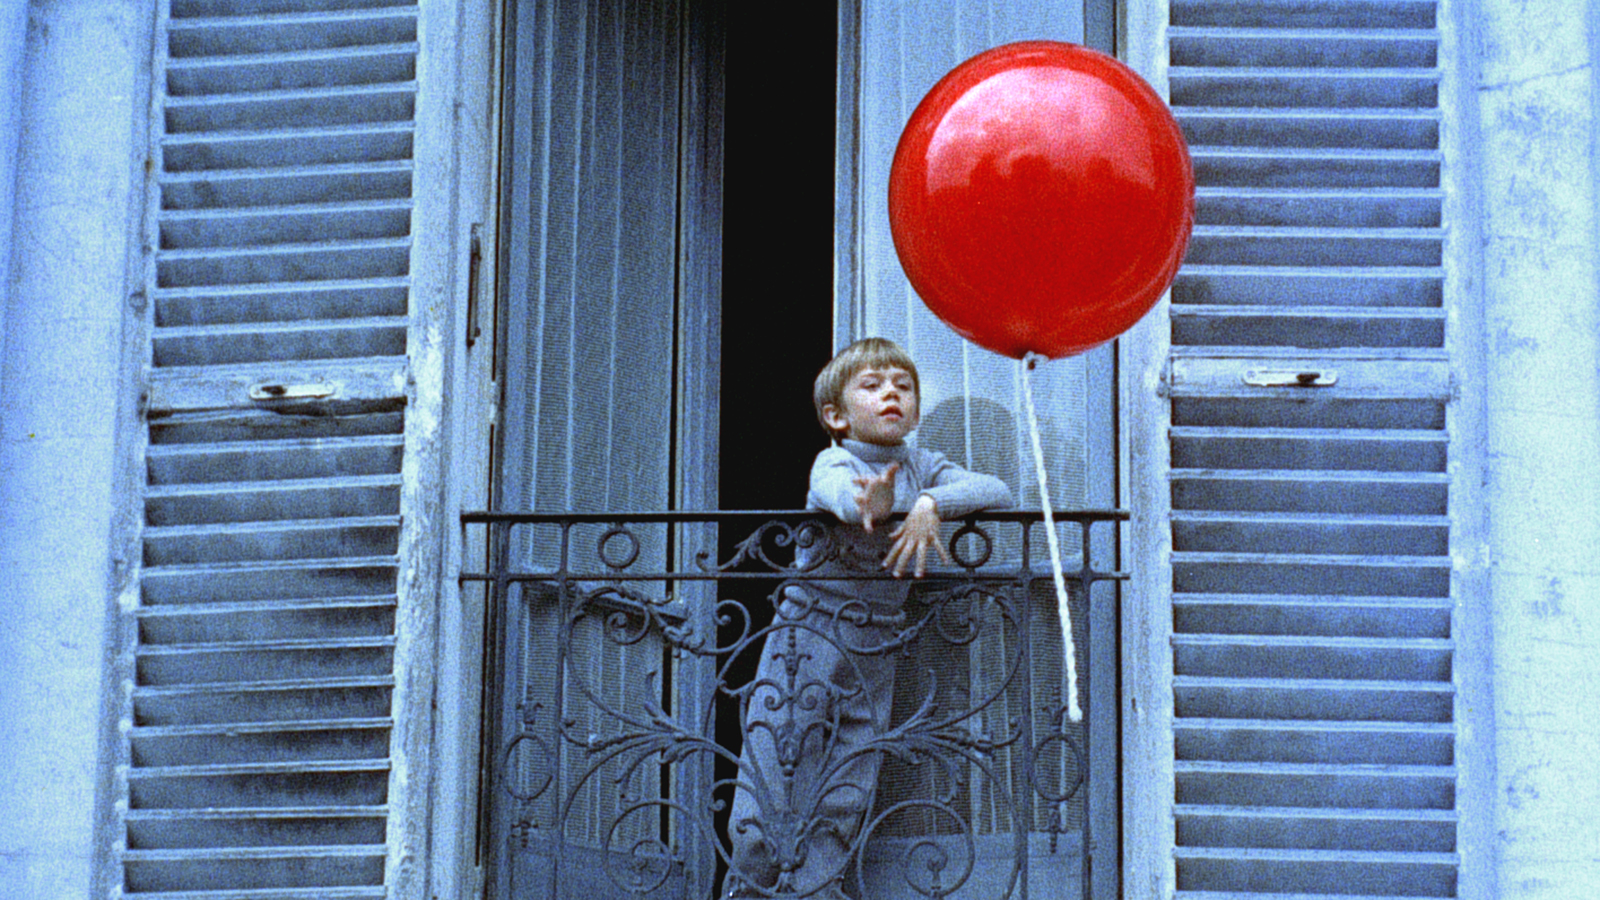 Janus Films The Red Balloon